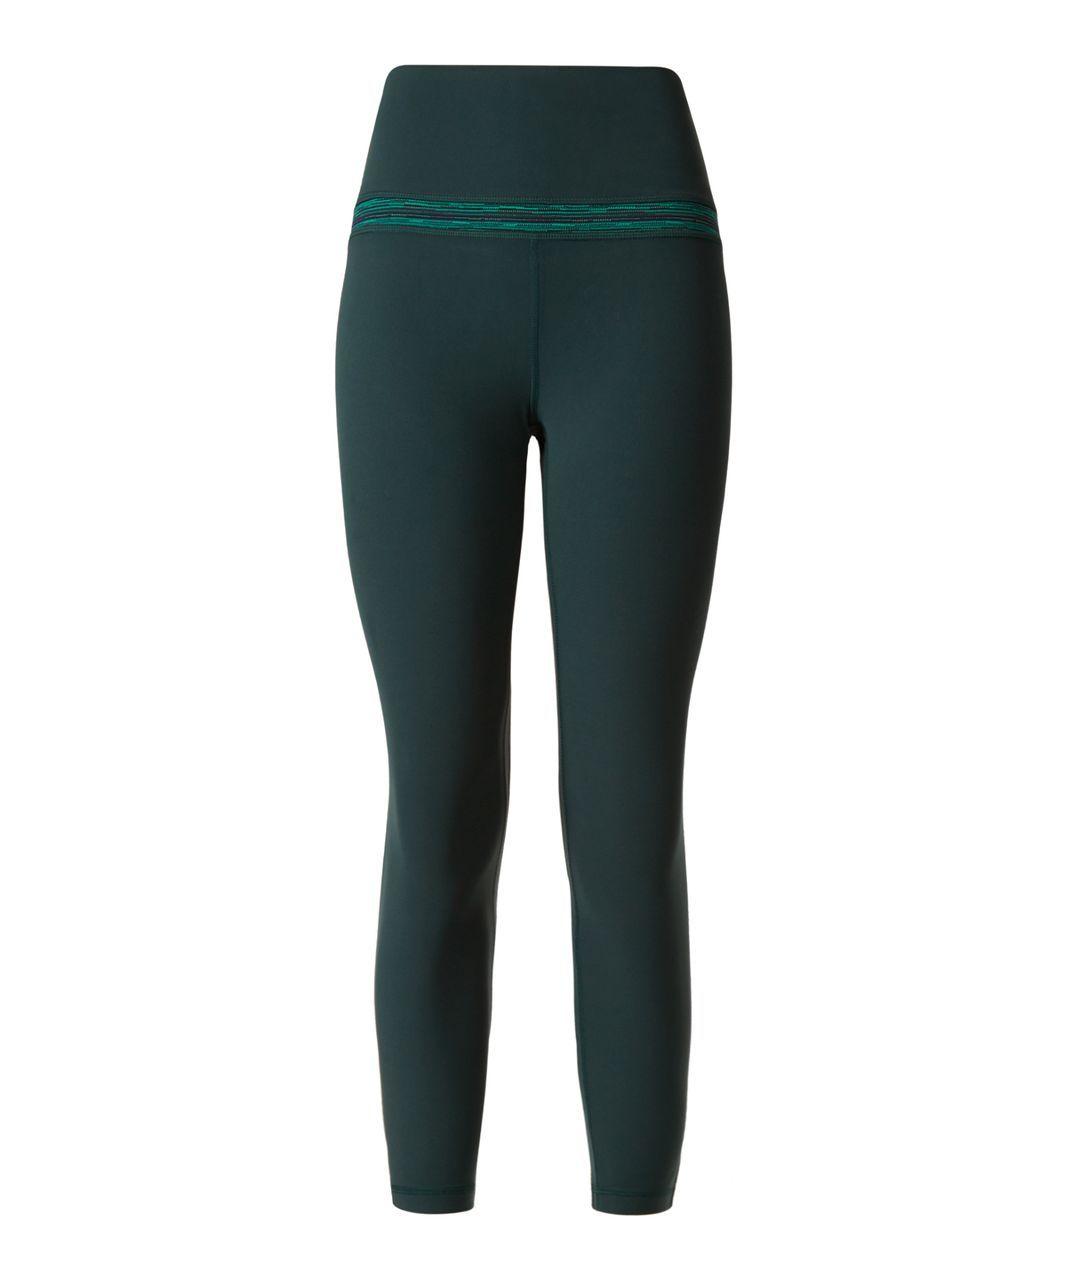 a45ad4125 Lululemon Align Pant - Deep Green   Cyber Jungle Hero Blue ...